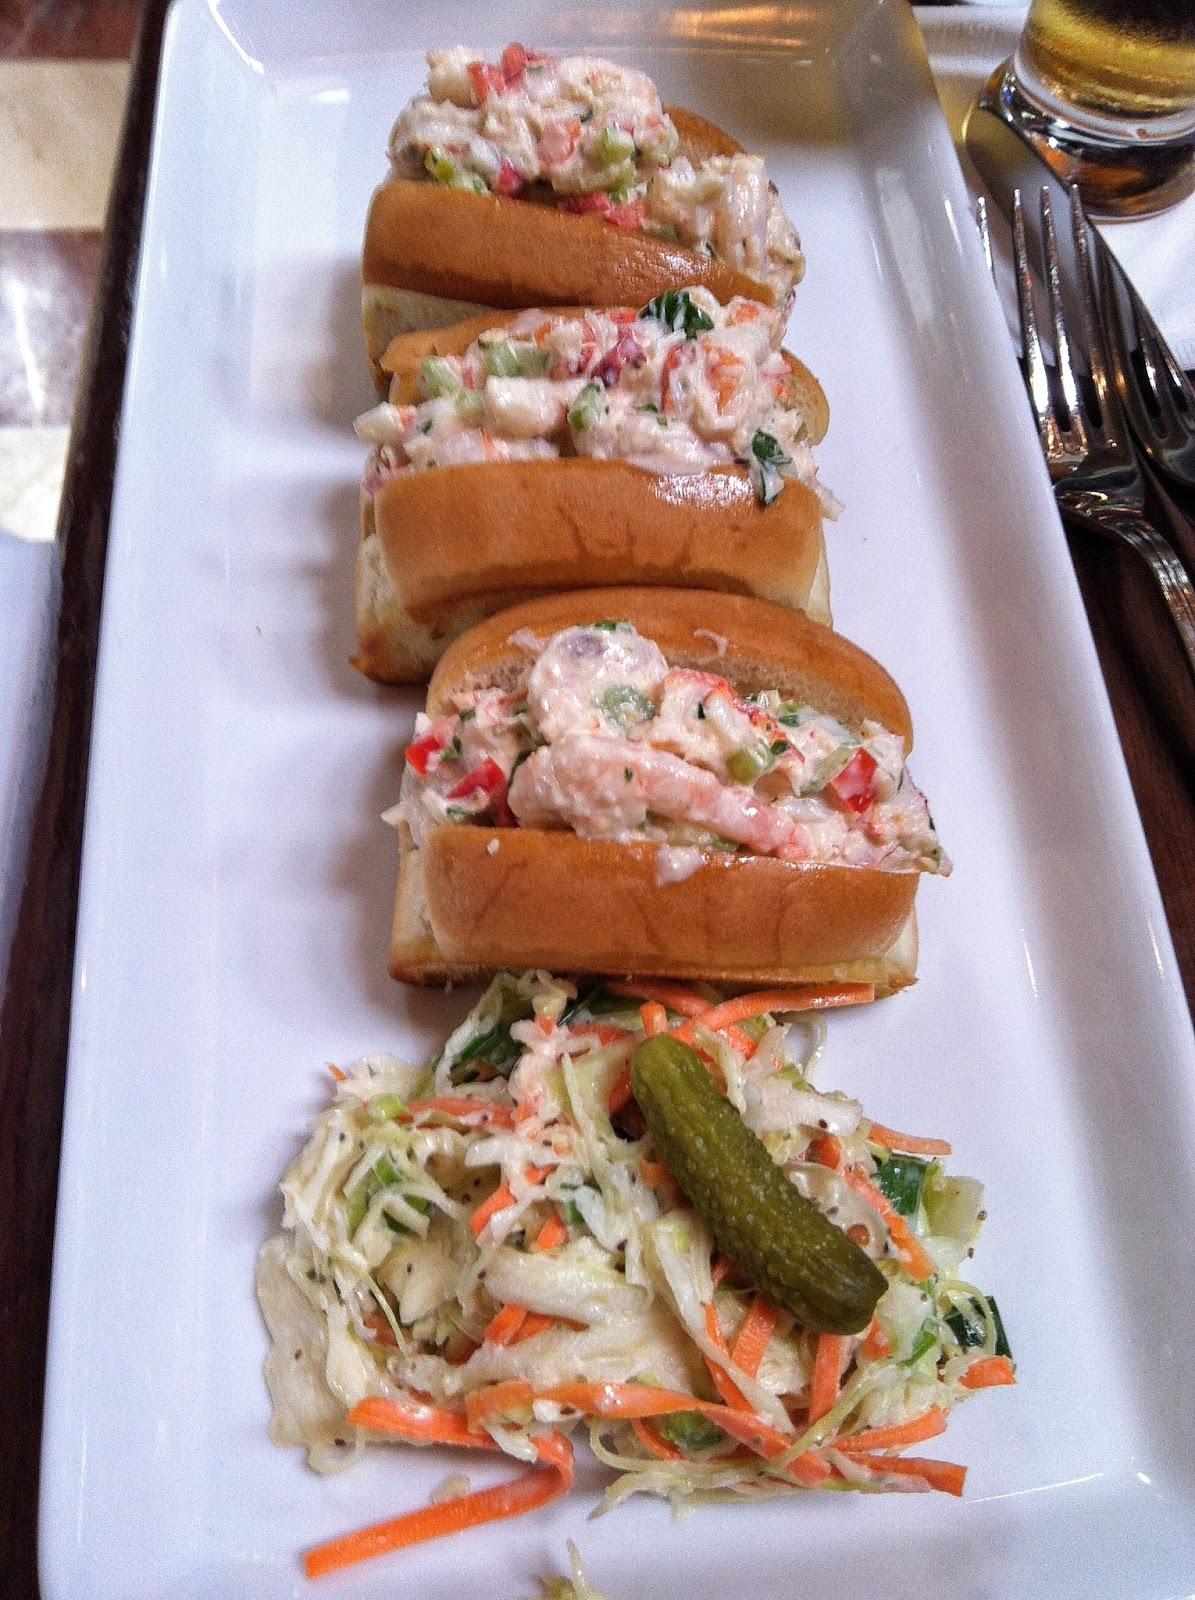 Mini lobster and shrimp rolls ($13.95)